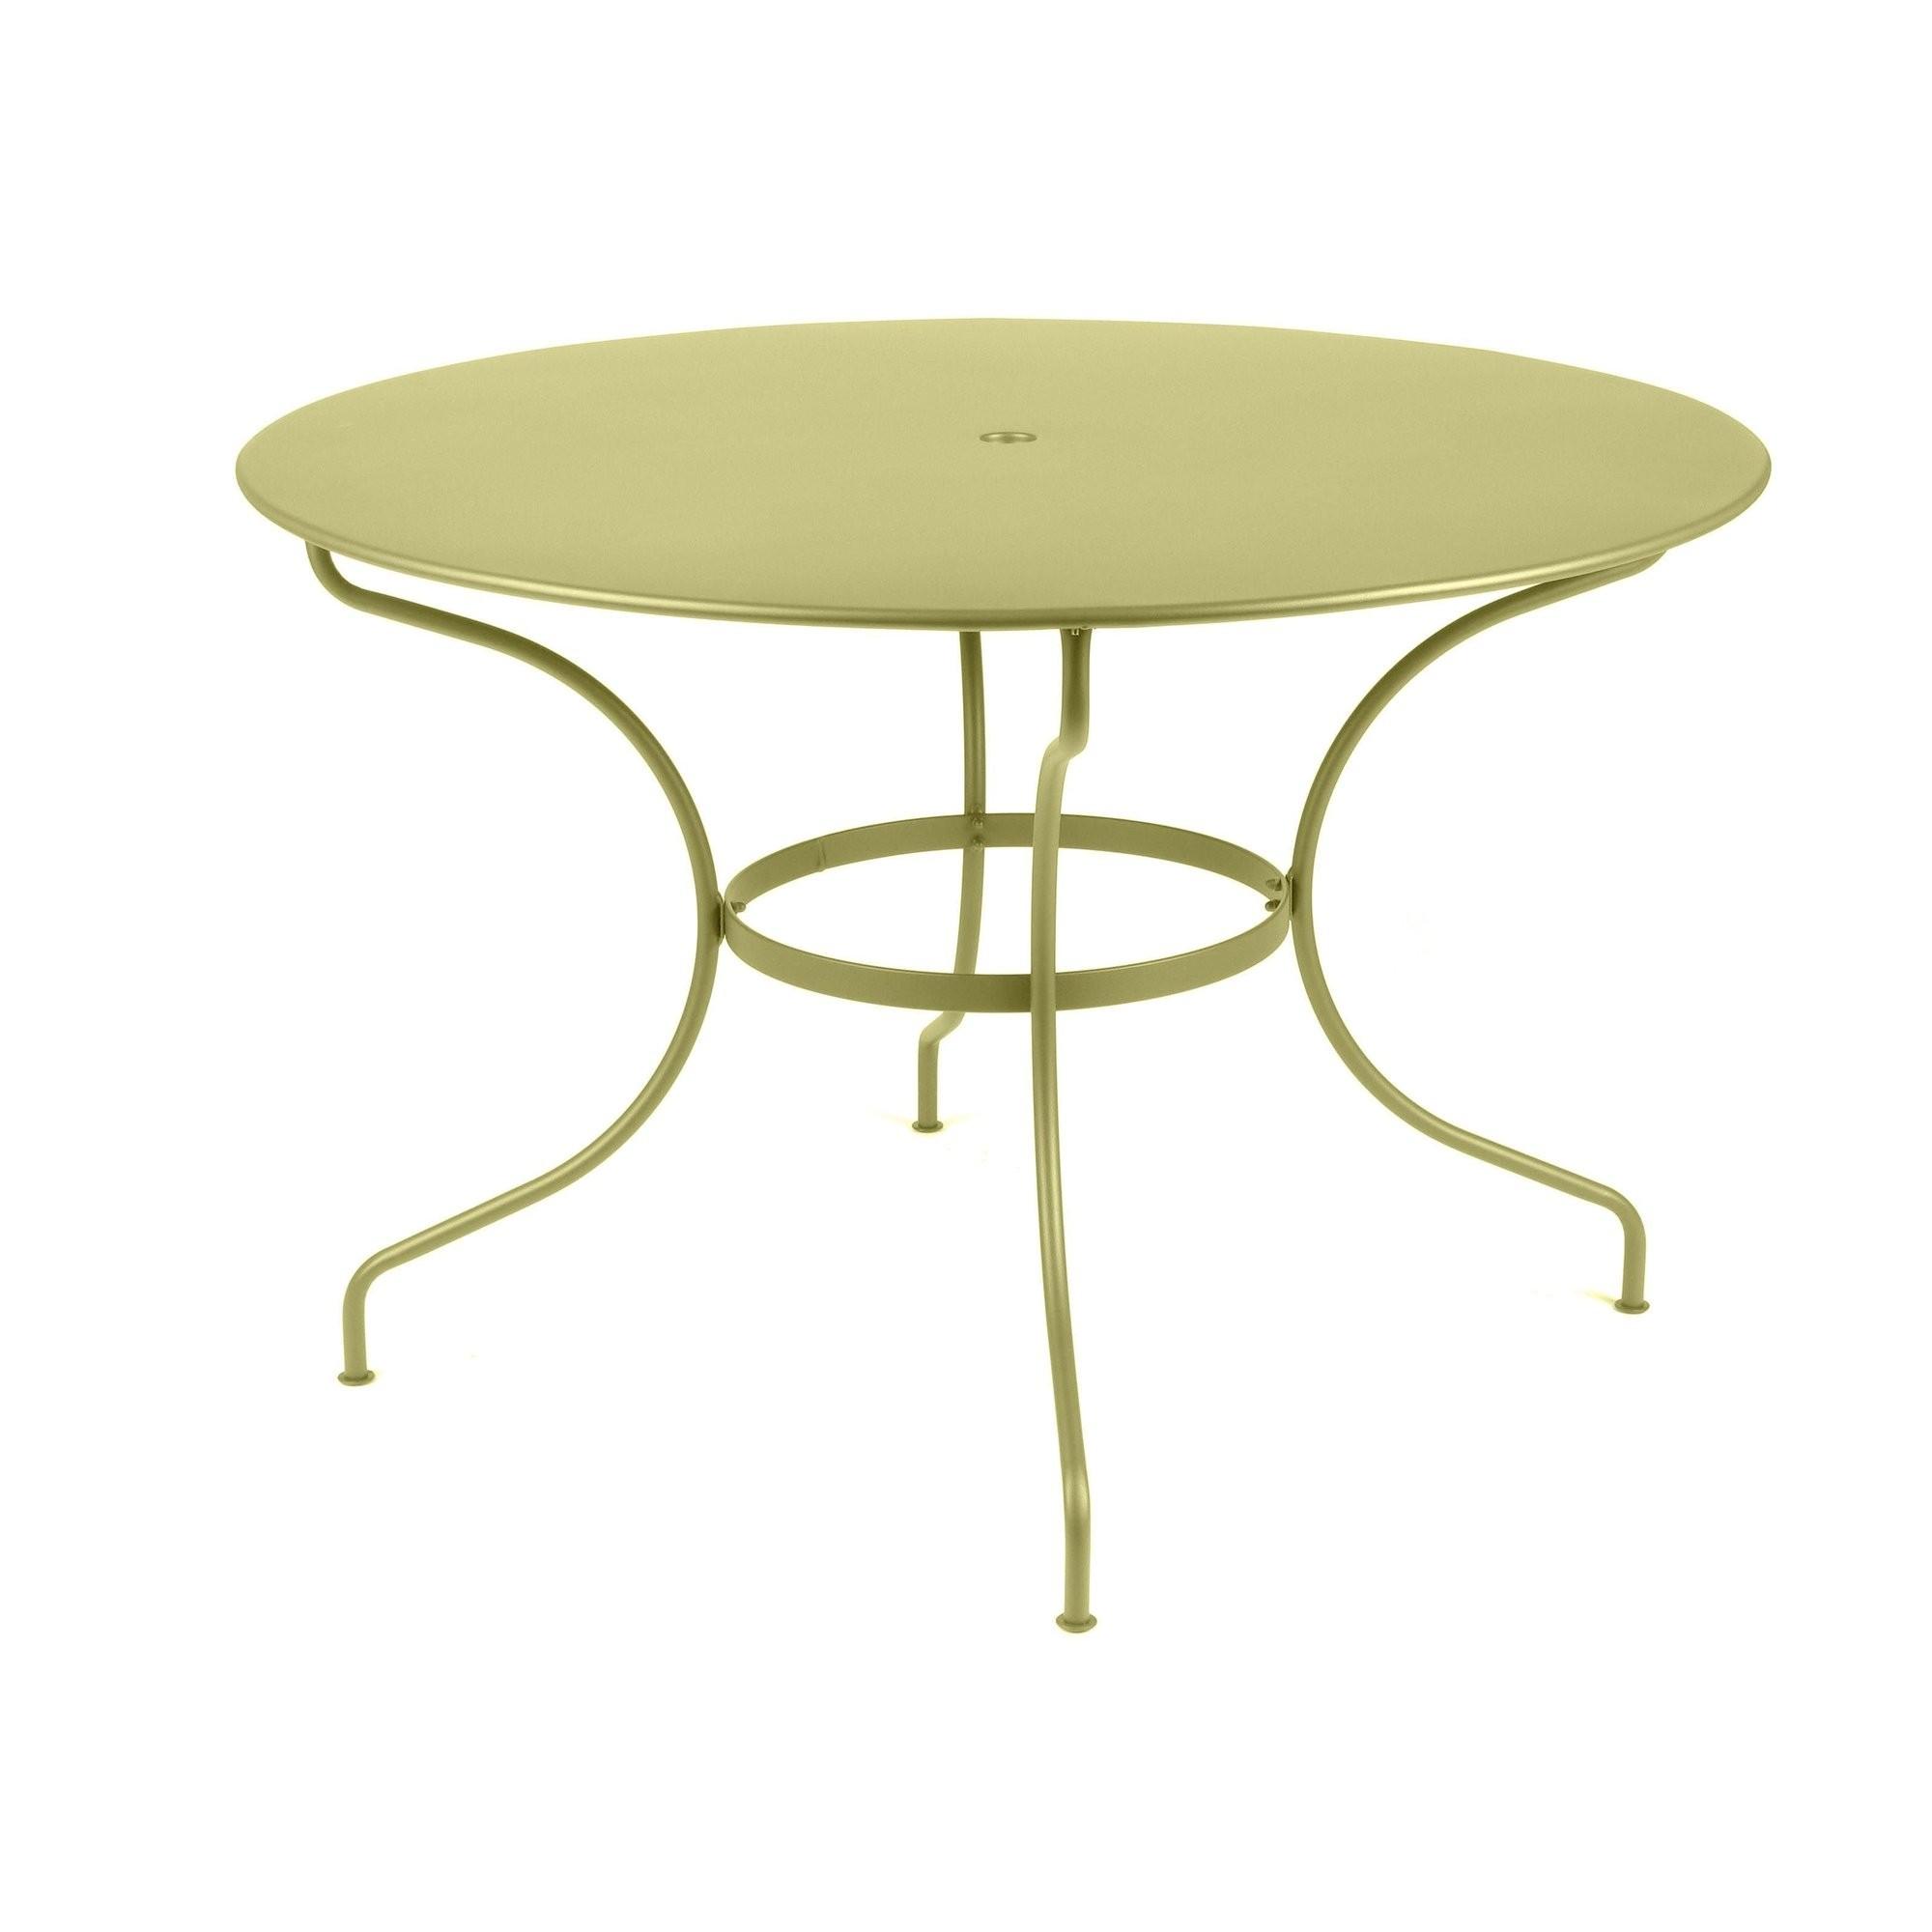 Table ronde op ra de fermob tilleul - Fermob opera table ...